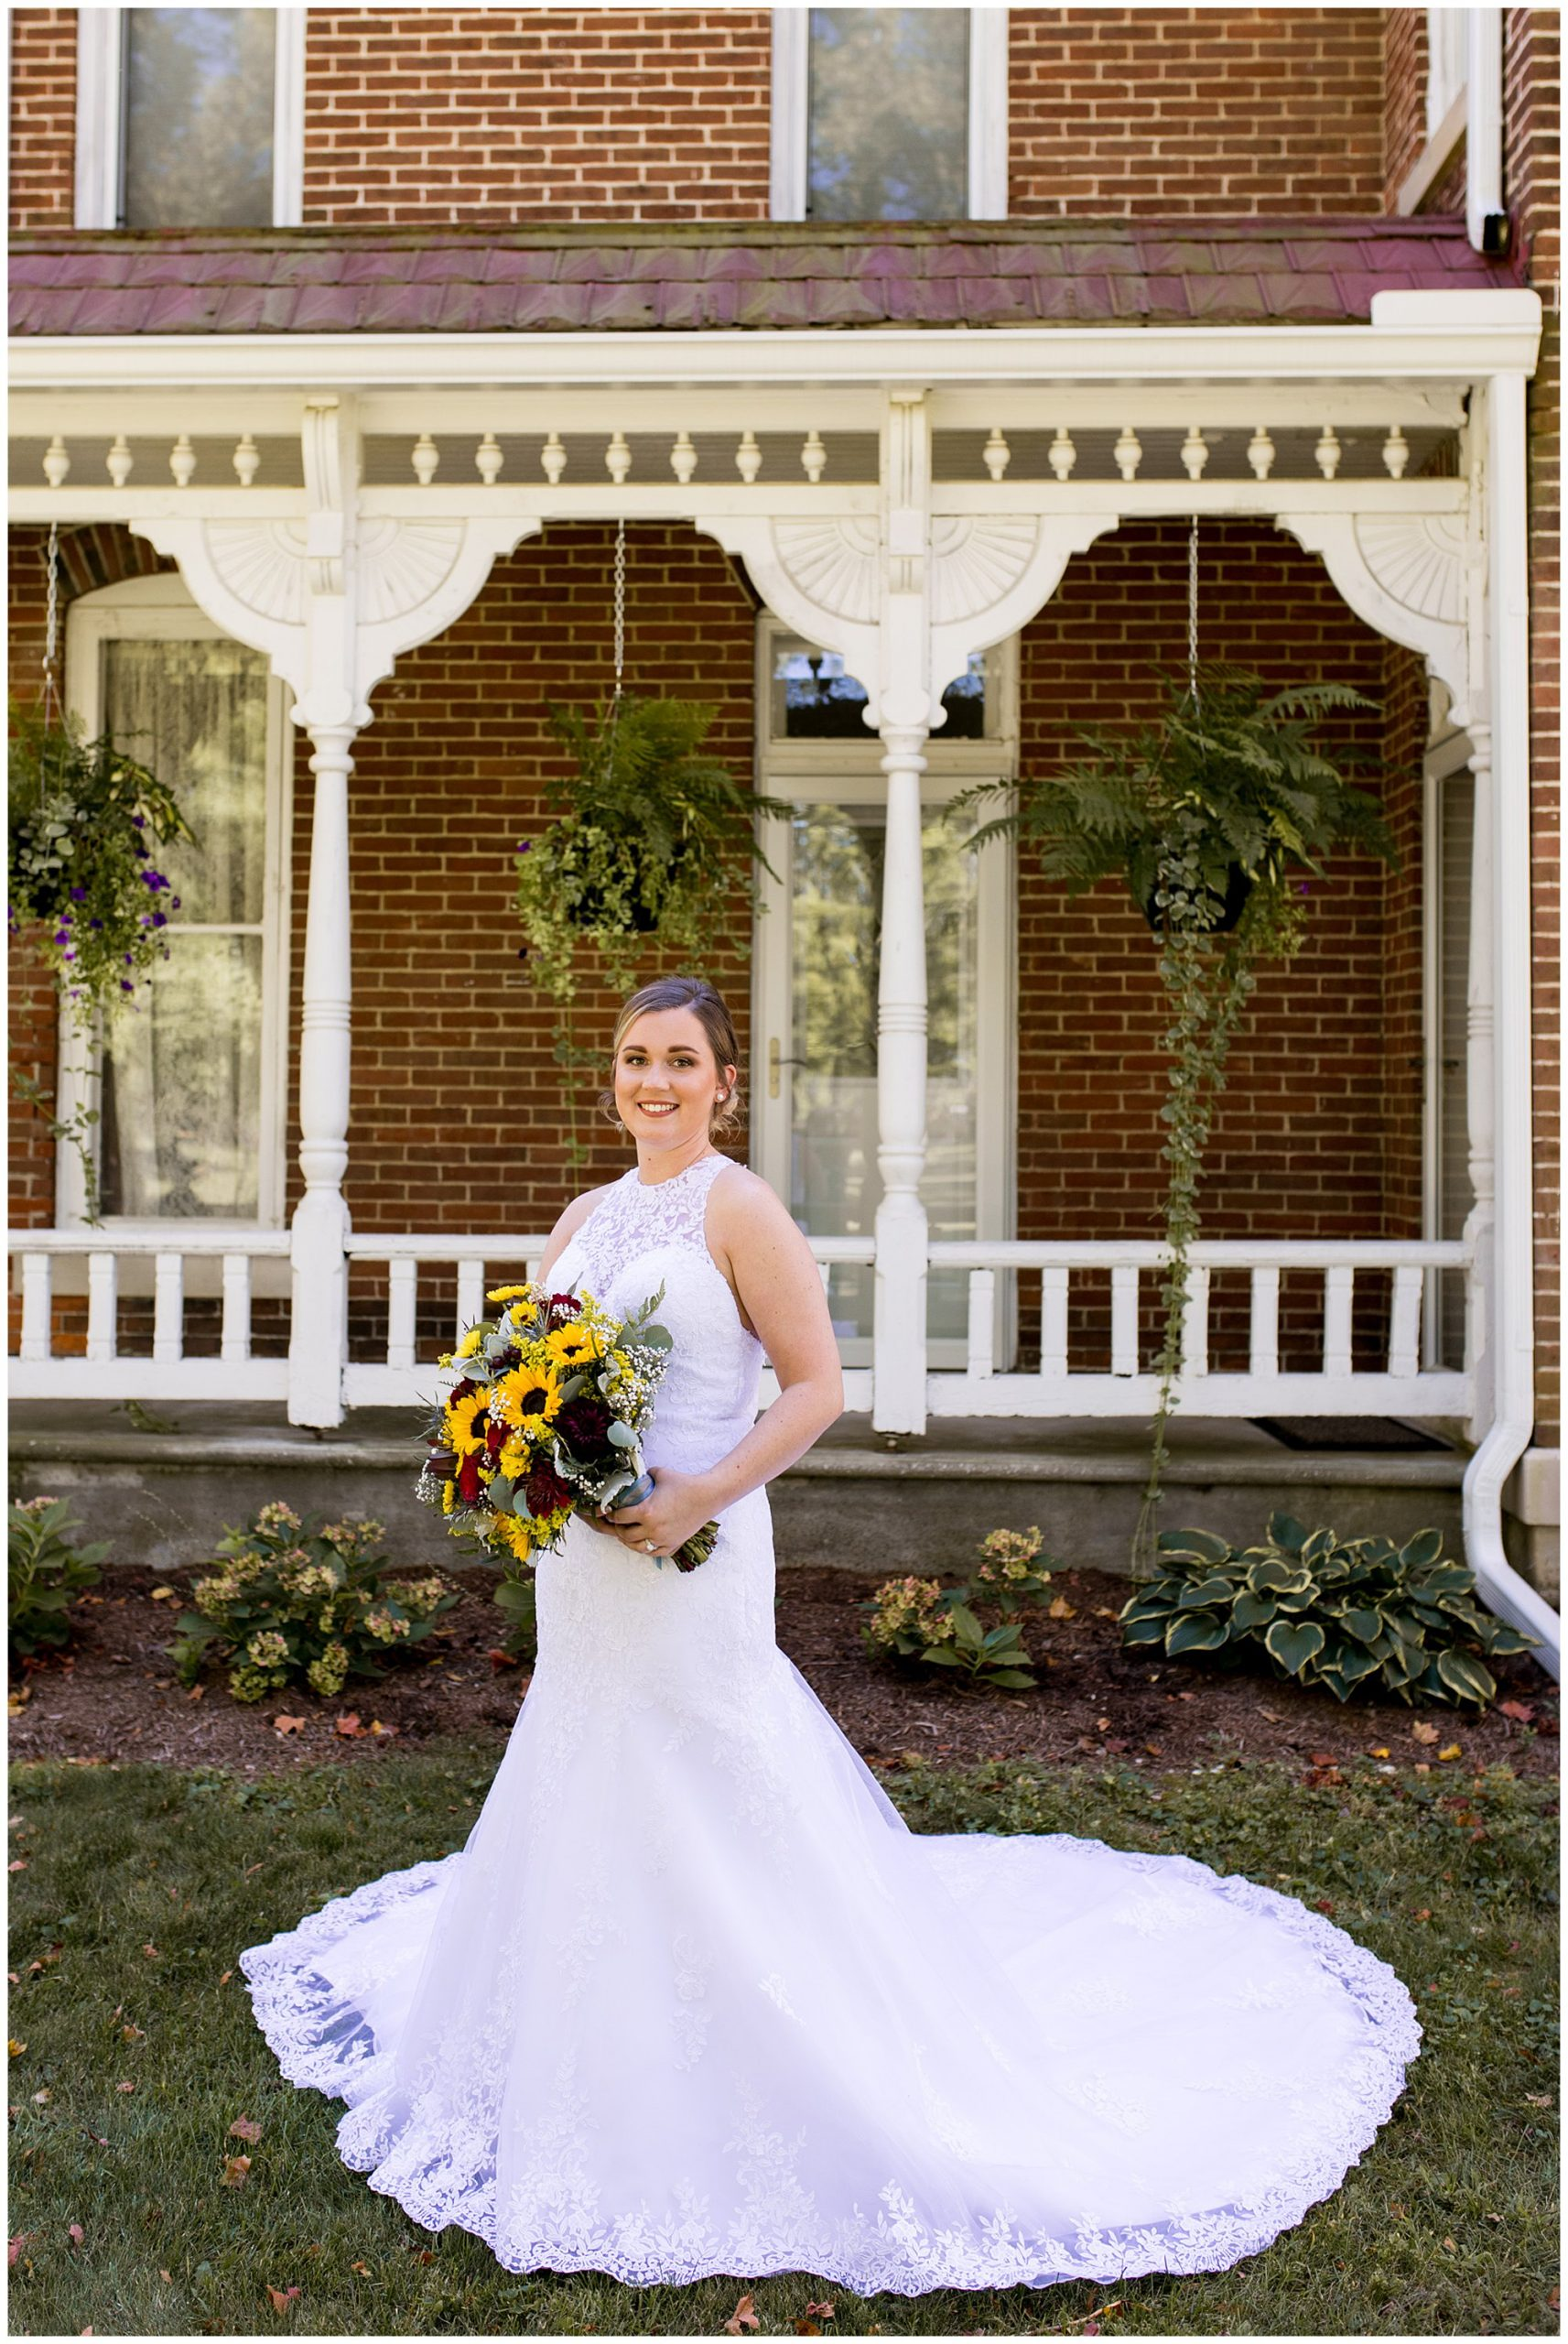 bride wedding photos before wedding ceremony at Legacy Barn in Kokomo Indiana